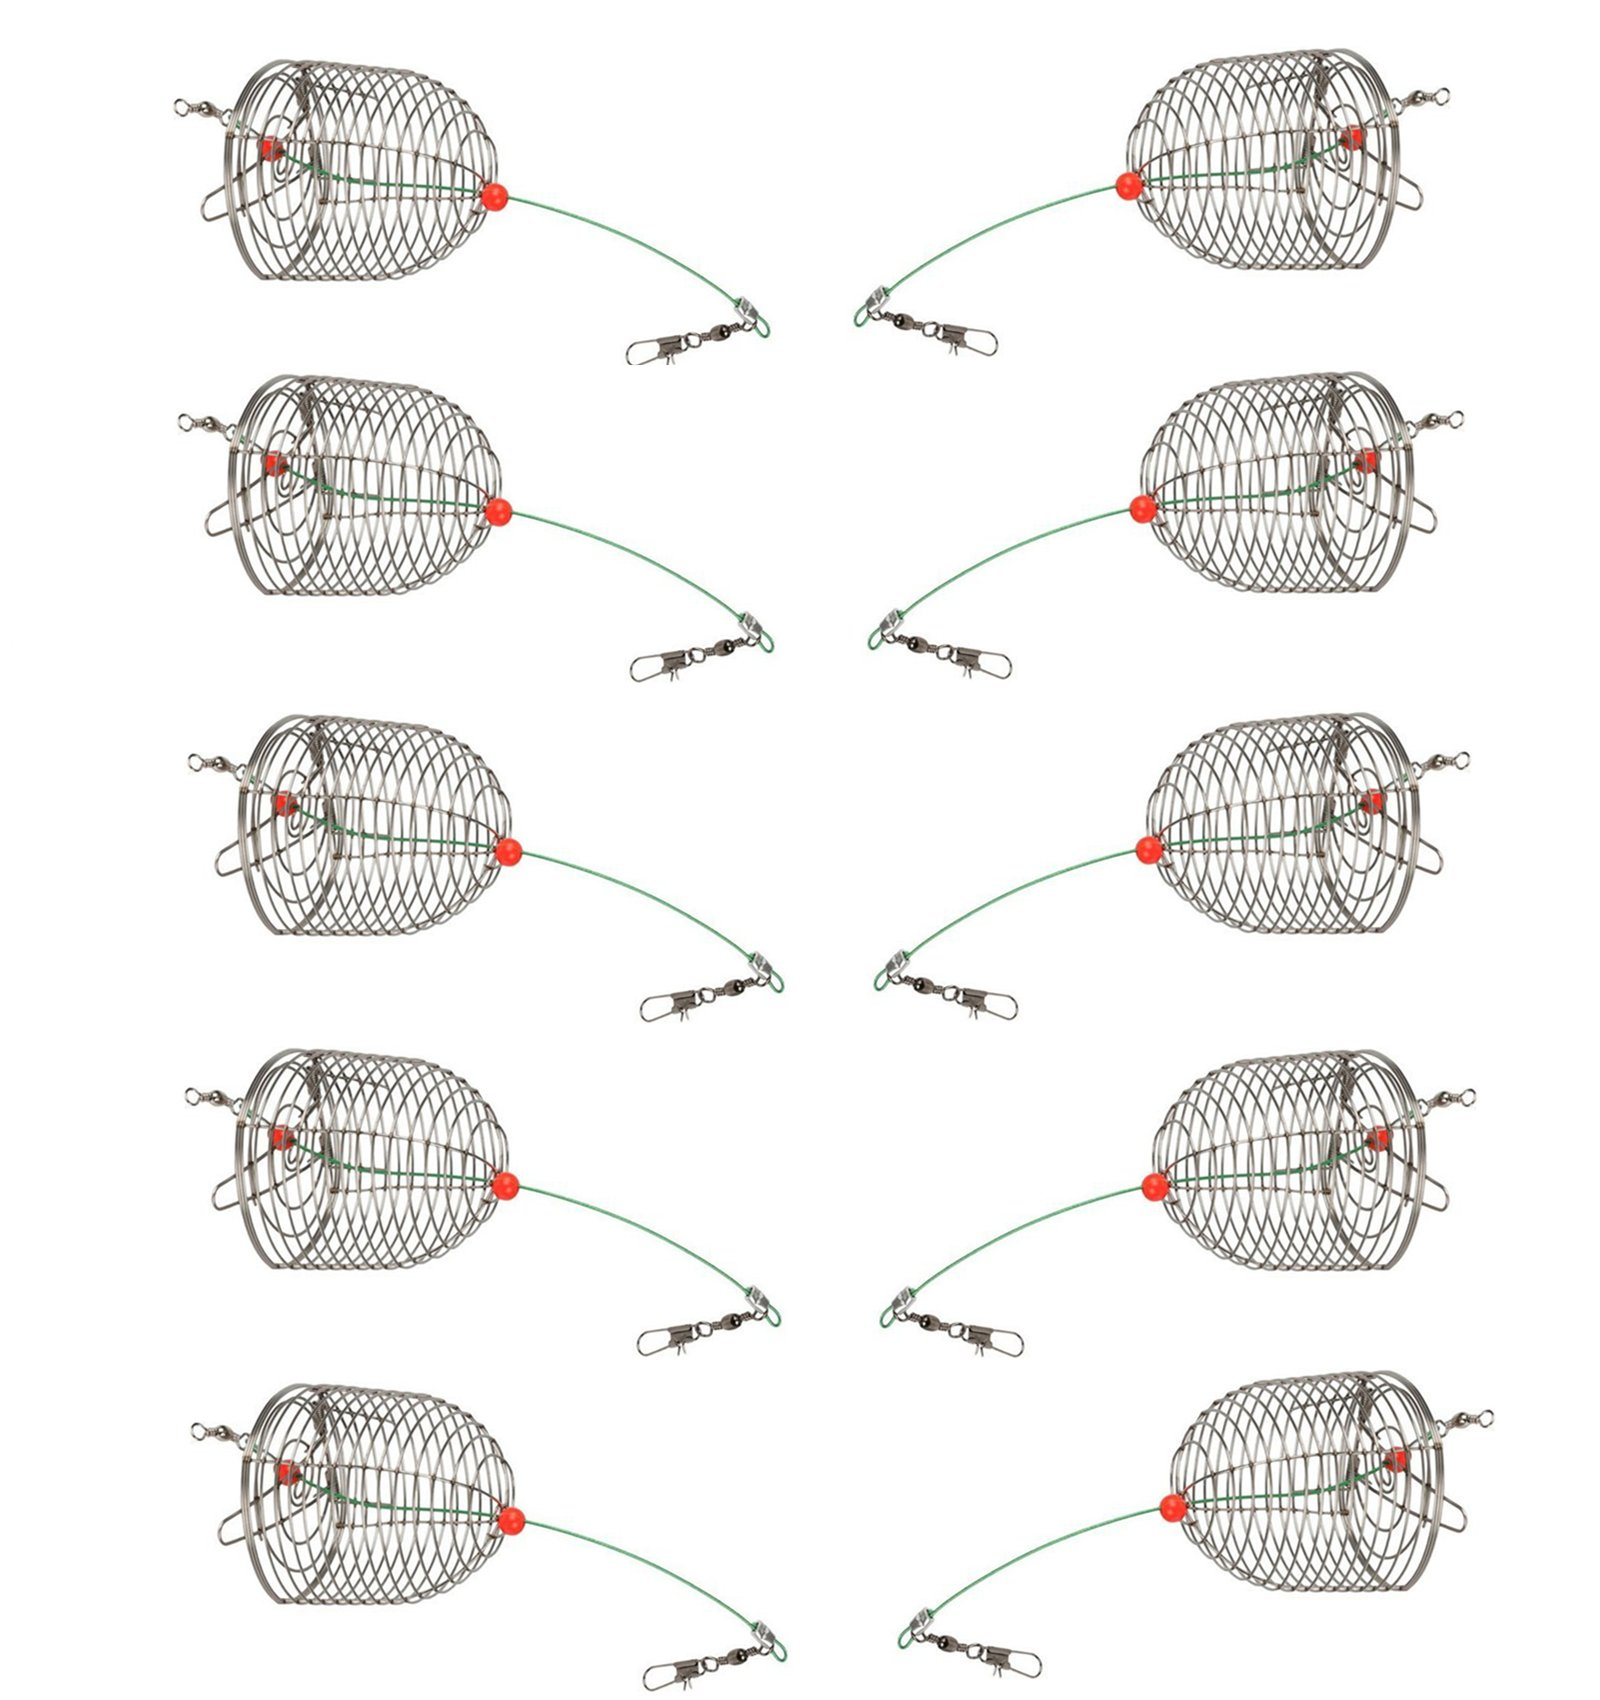 Mimilure 10Pcs/Pk Carp Fishing Bait Trap Cage Feeder Basket Holder Coarse Lure Feeder Carp Fishing Tackle Kit,Medium,Trap Dia 4CM